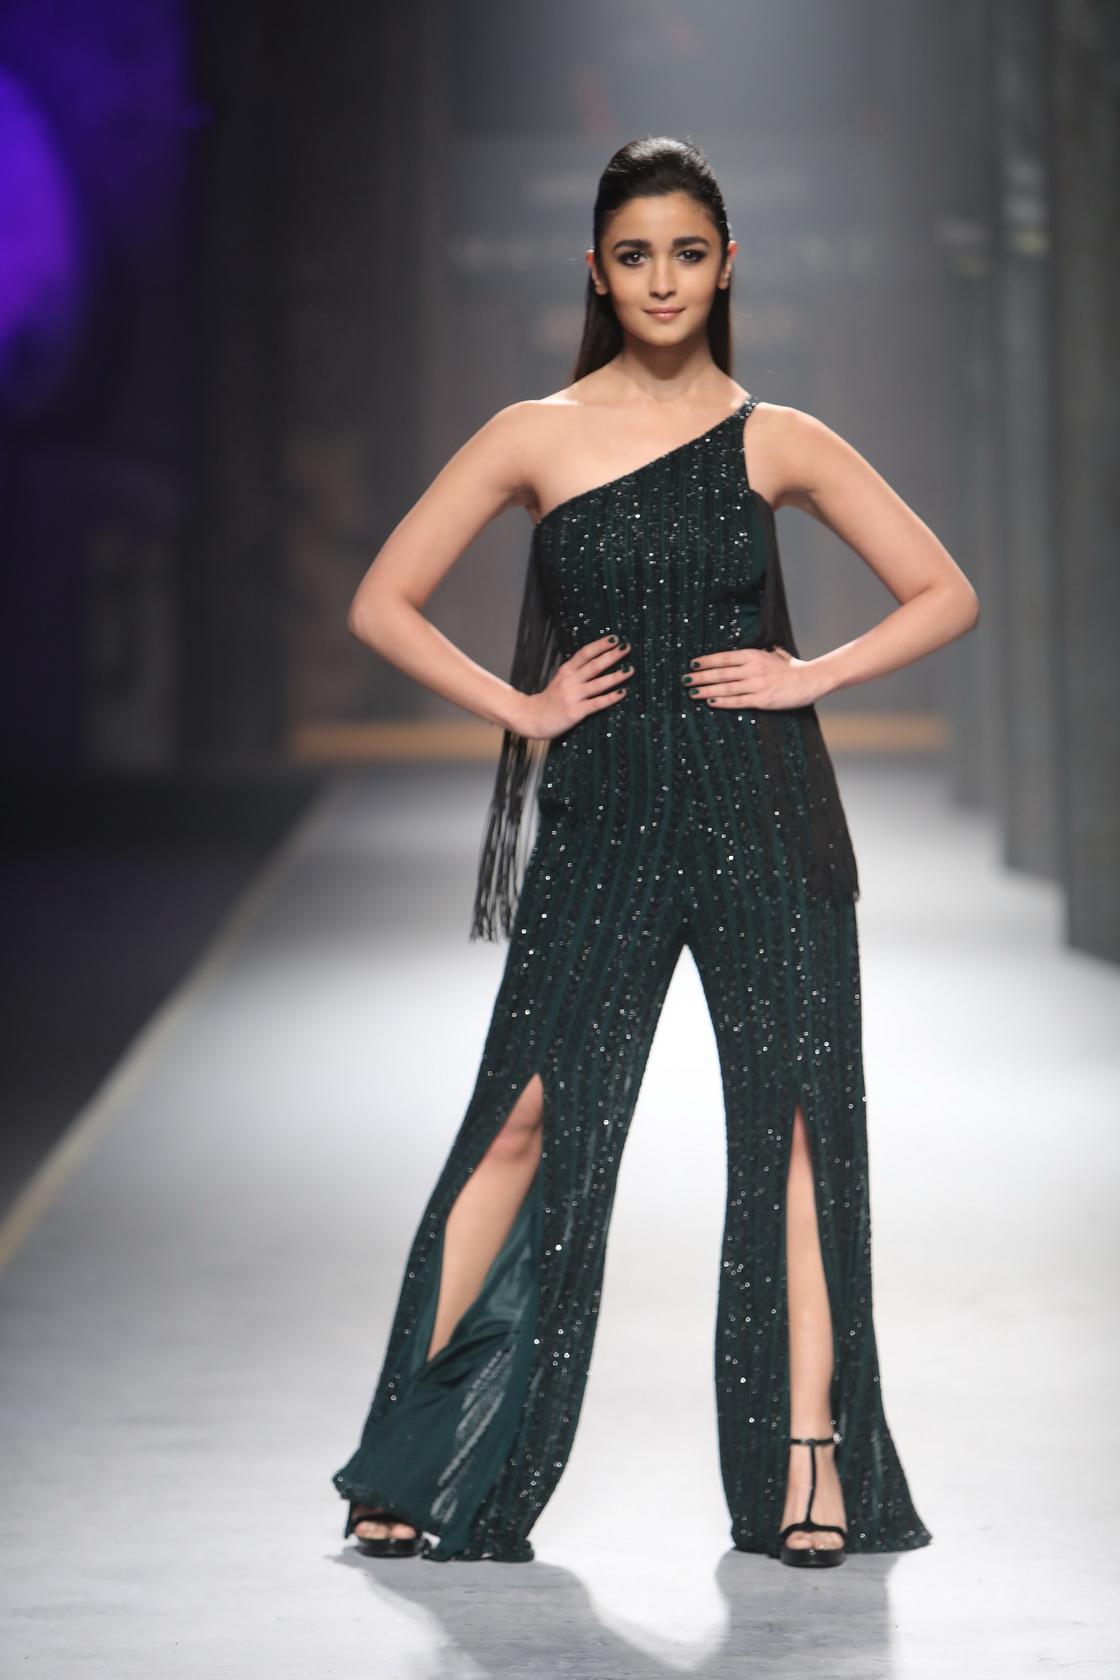 Alia Bhatt for Namrata Joshipura - Amazon India Fashion Week AW17